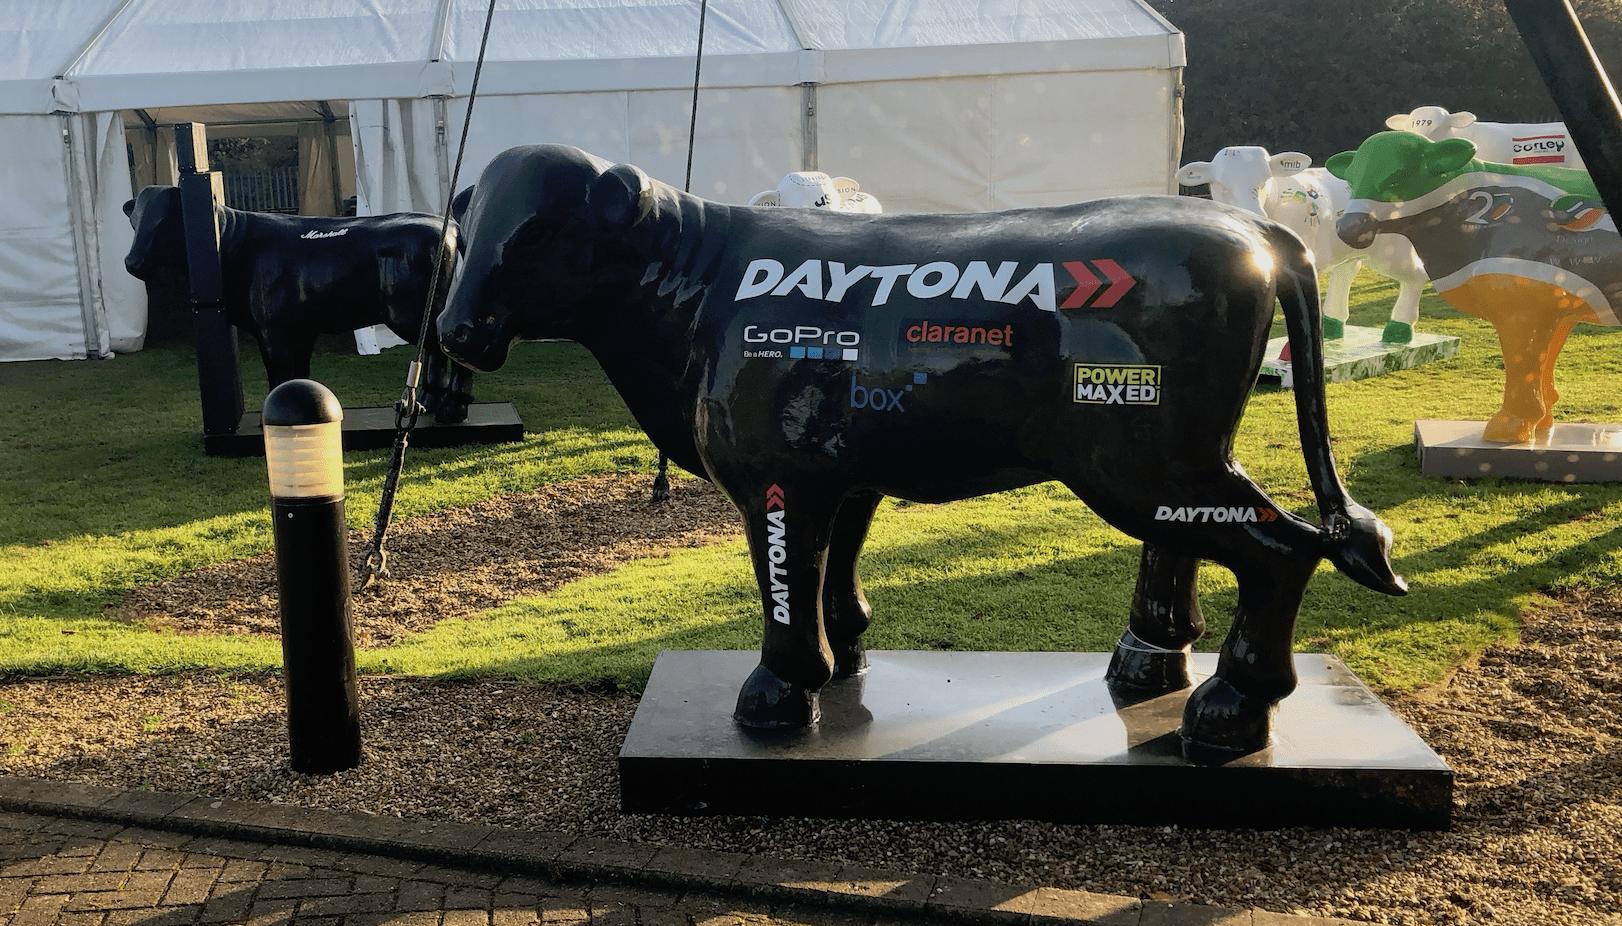 Daytona hosts the HerdABOUTMK Raceday